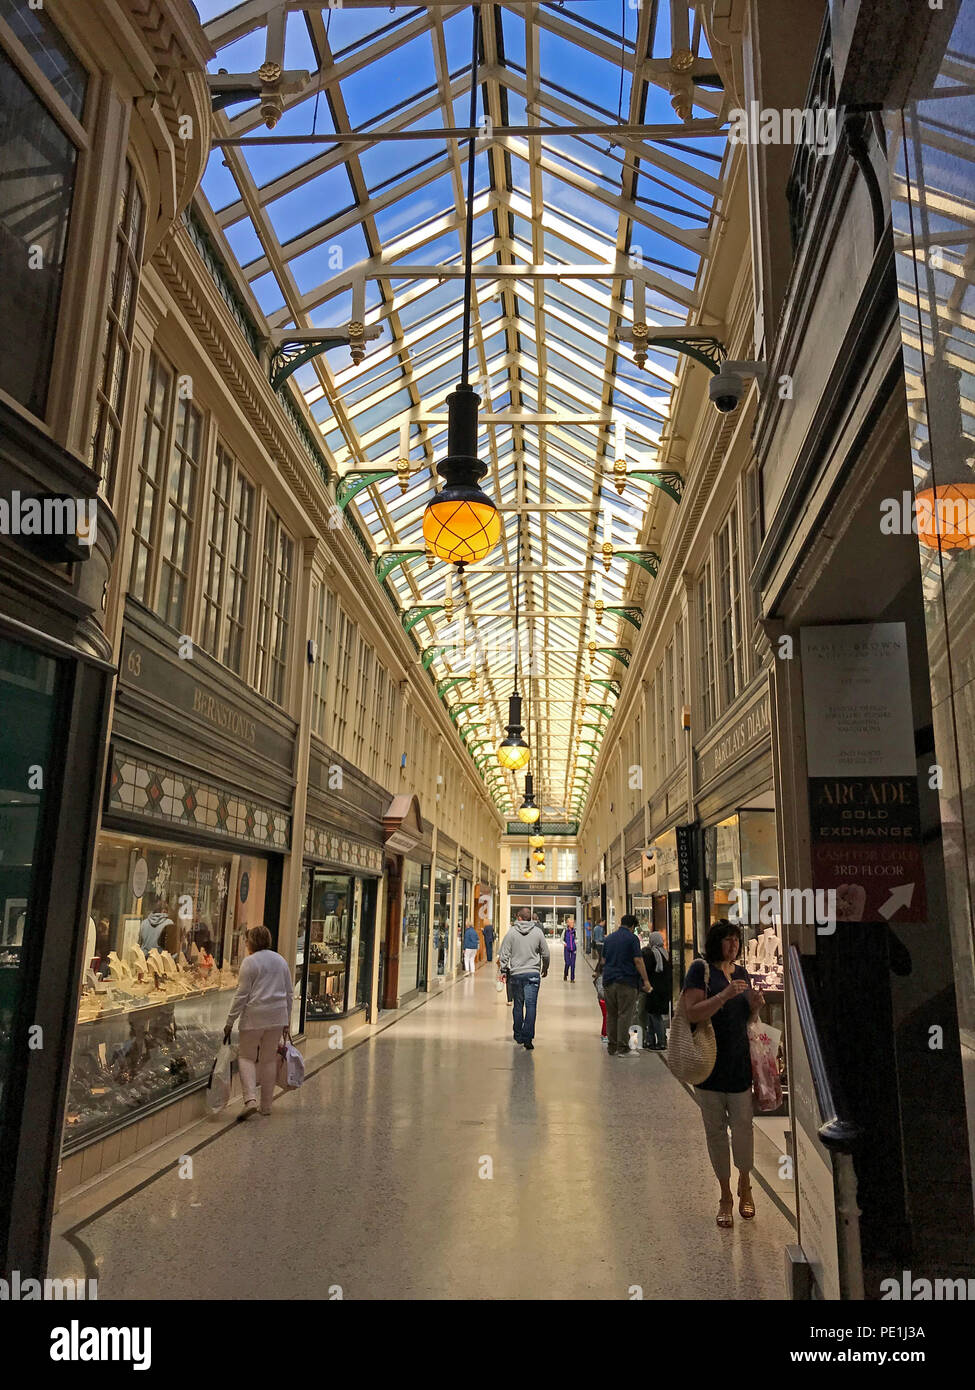 GoTonySmith @HotpixUK,GoTonySmith,@HotpixUK,city centre,Victorian,GB,shopping,retail,Arcade,Strathcylde,UK,shop,retailing,roof,canopy,light,lighting